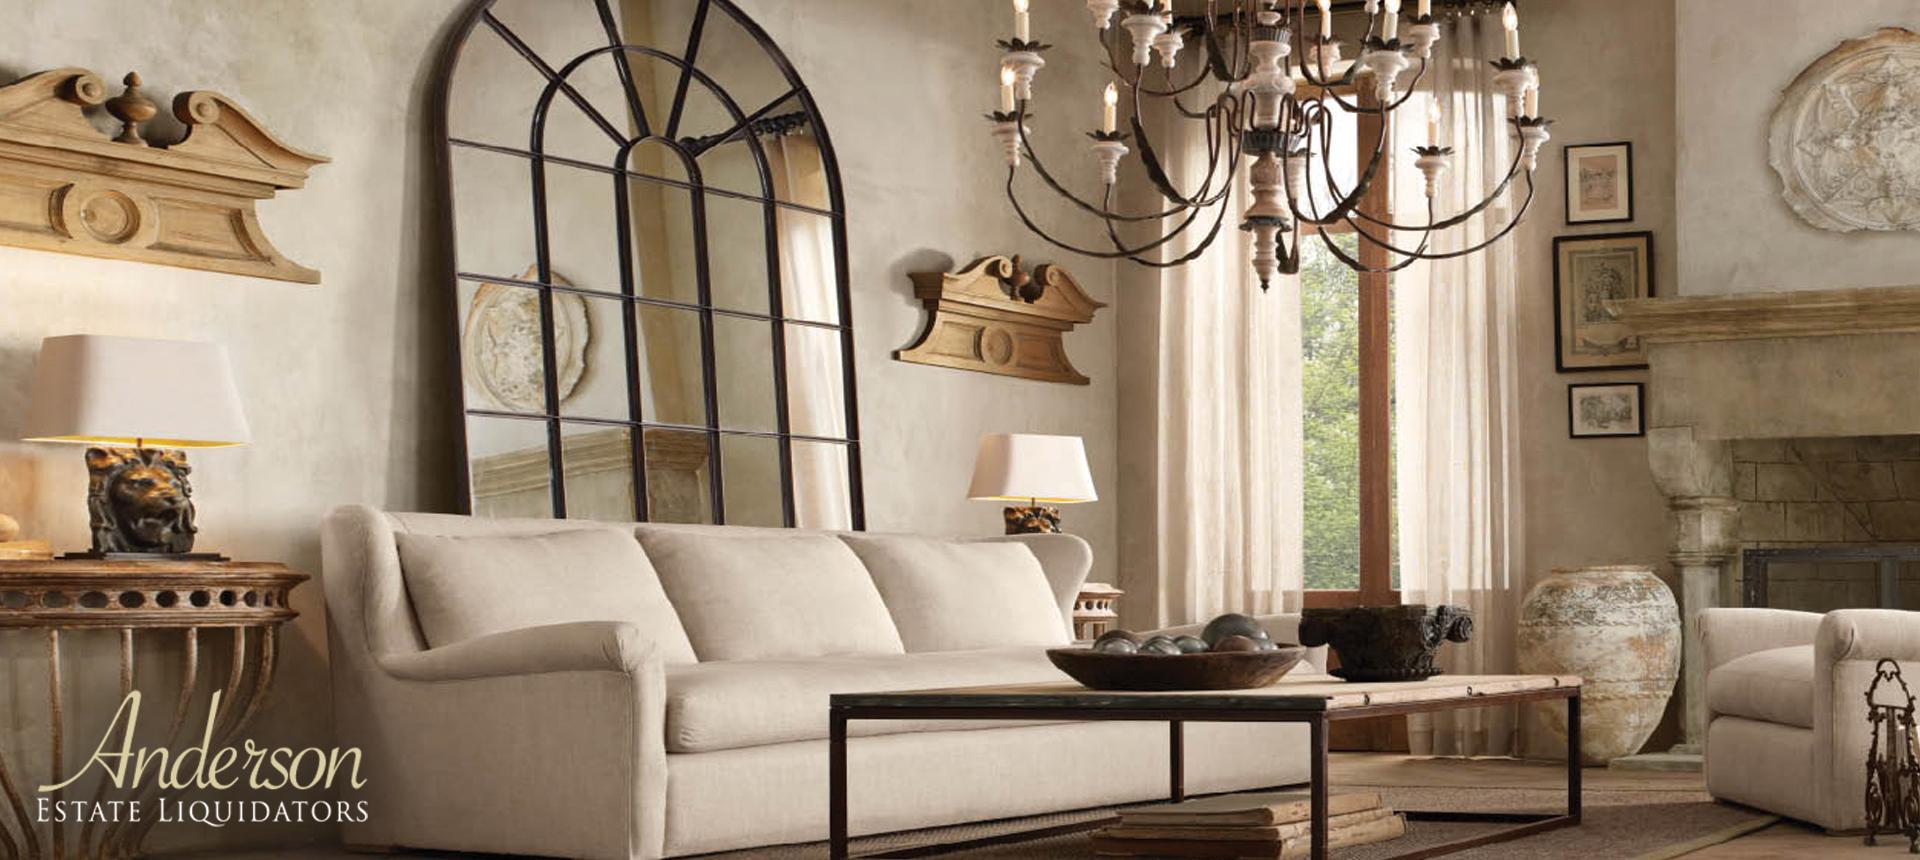 hanging chair restoration hardware folding history anderson estate liquidators bay area sales let us